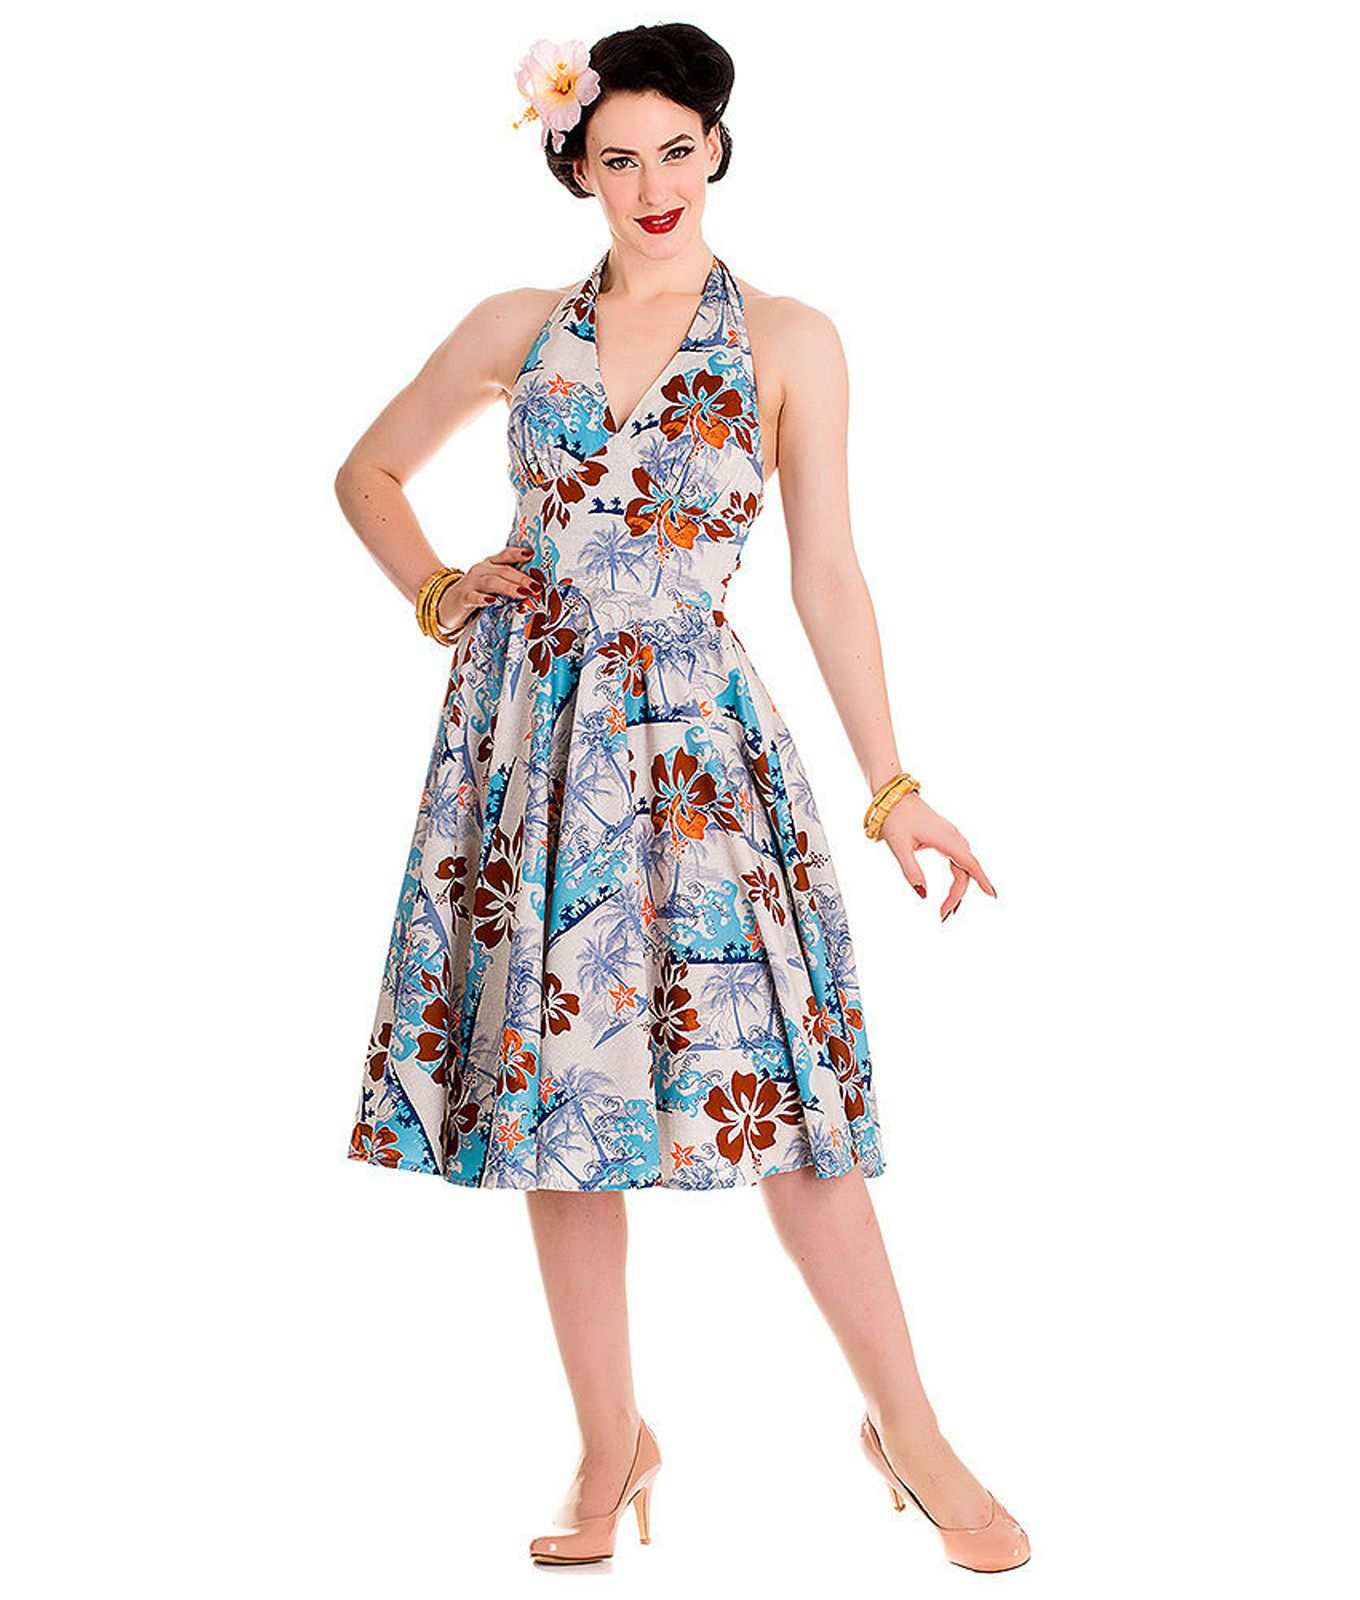 8c7630165ba Found on the Tiger Milly website.Hell Bunny 50s Vintage Style Hawaiian Tiki  Halterneck Dress